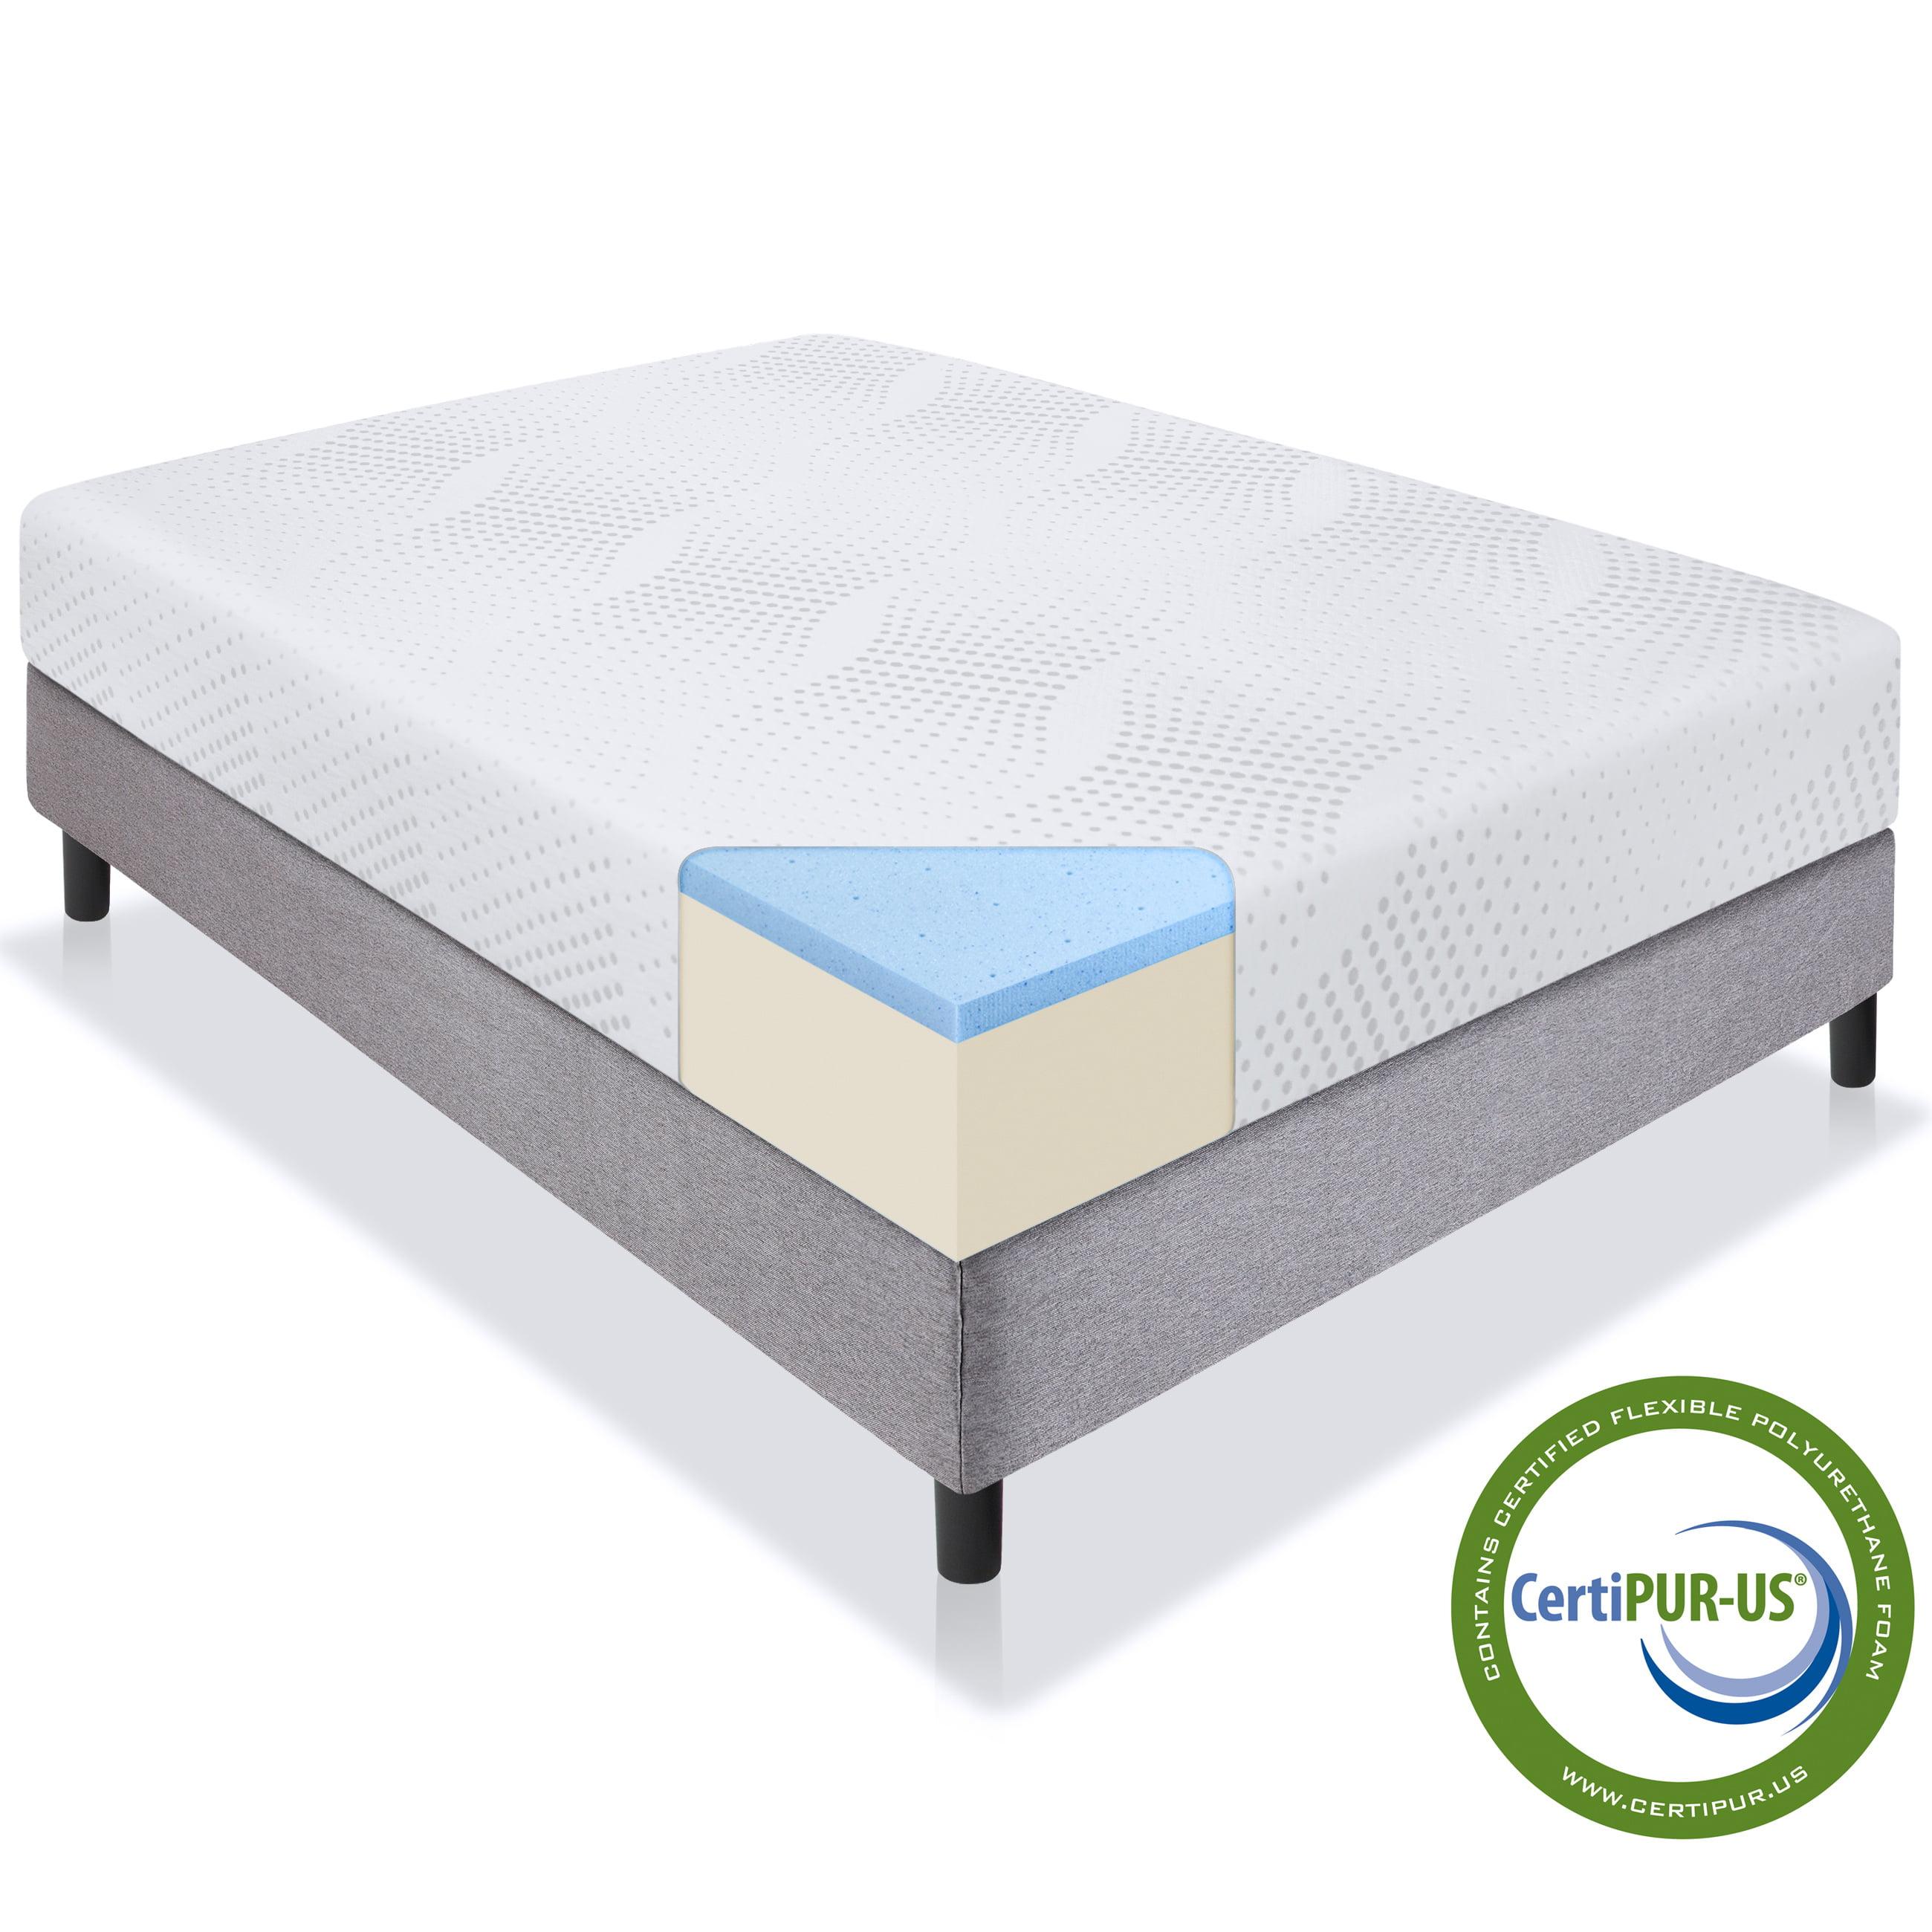 Best Choice Products 10in Twin Size Dual Layered Gel Memory Foam Mattress w/ CertiPUR-US Certified Foam